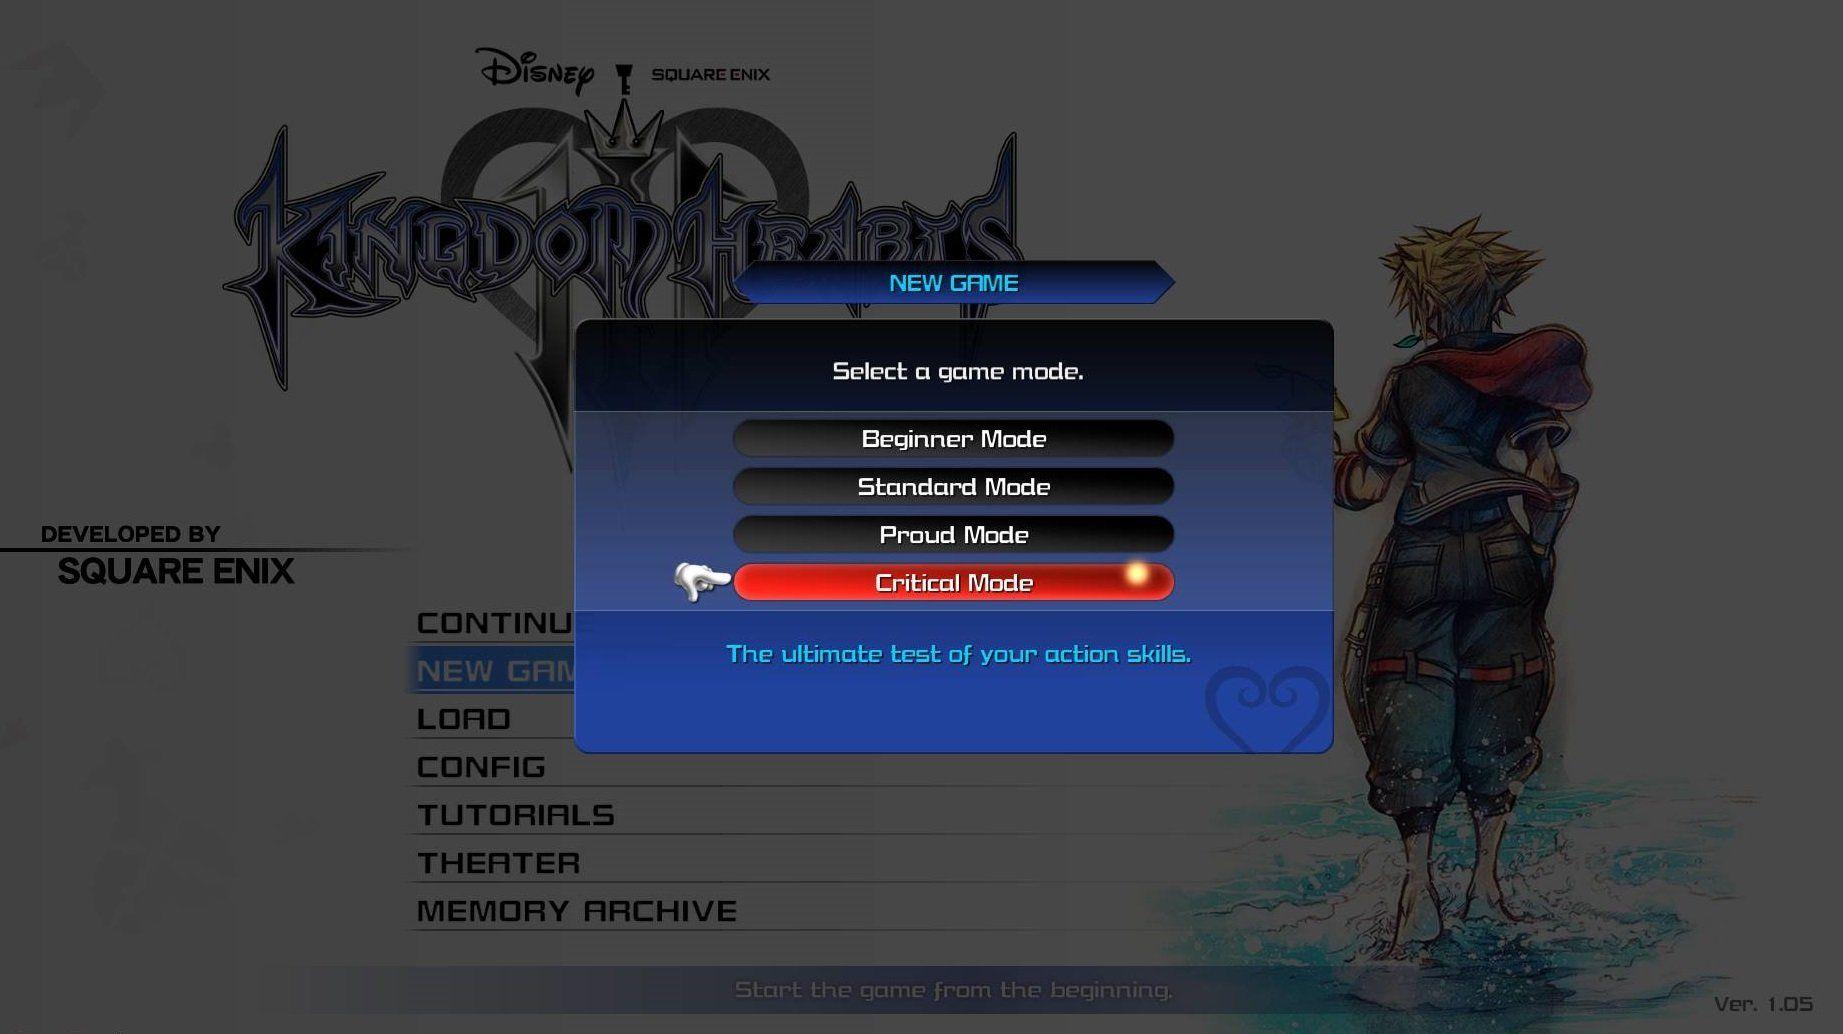 Resogun Blasting to PS3, PS Vita on 12/23 – PlayStation.Blog